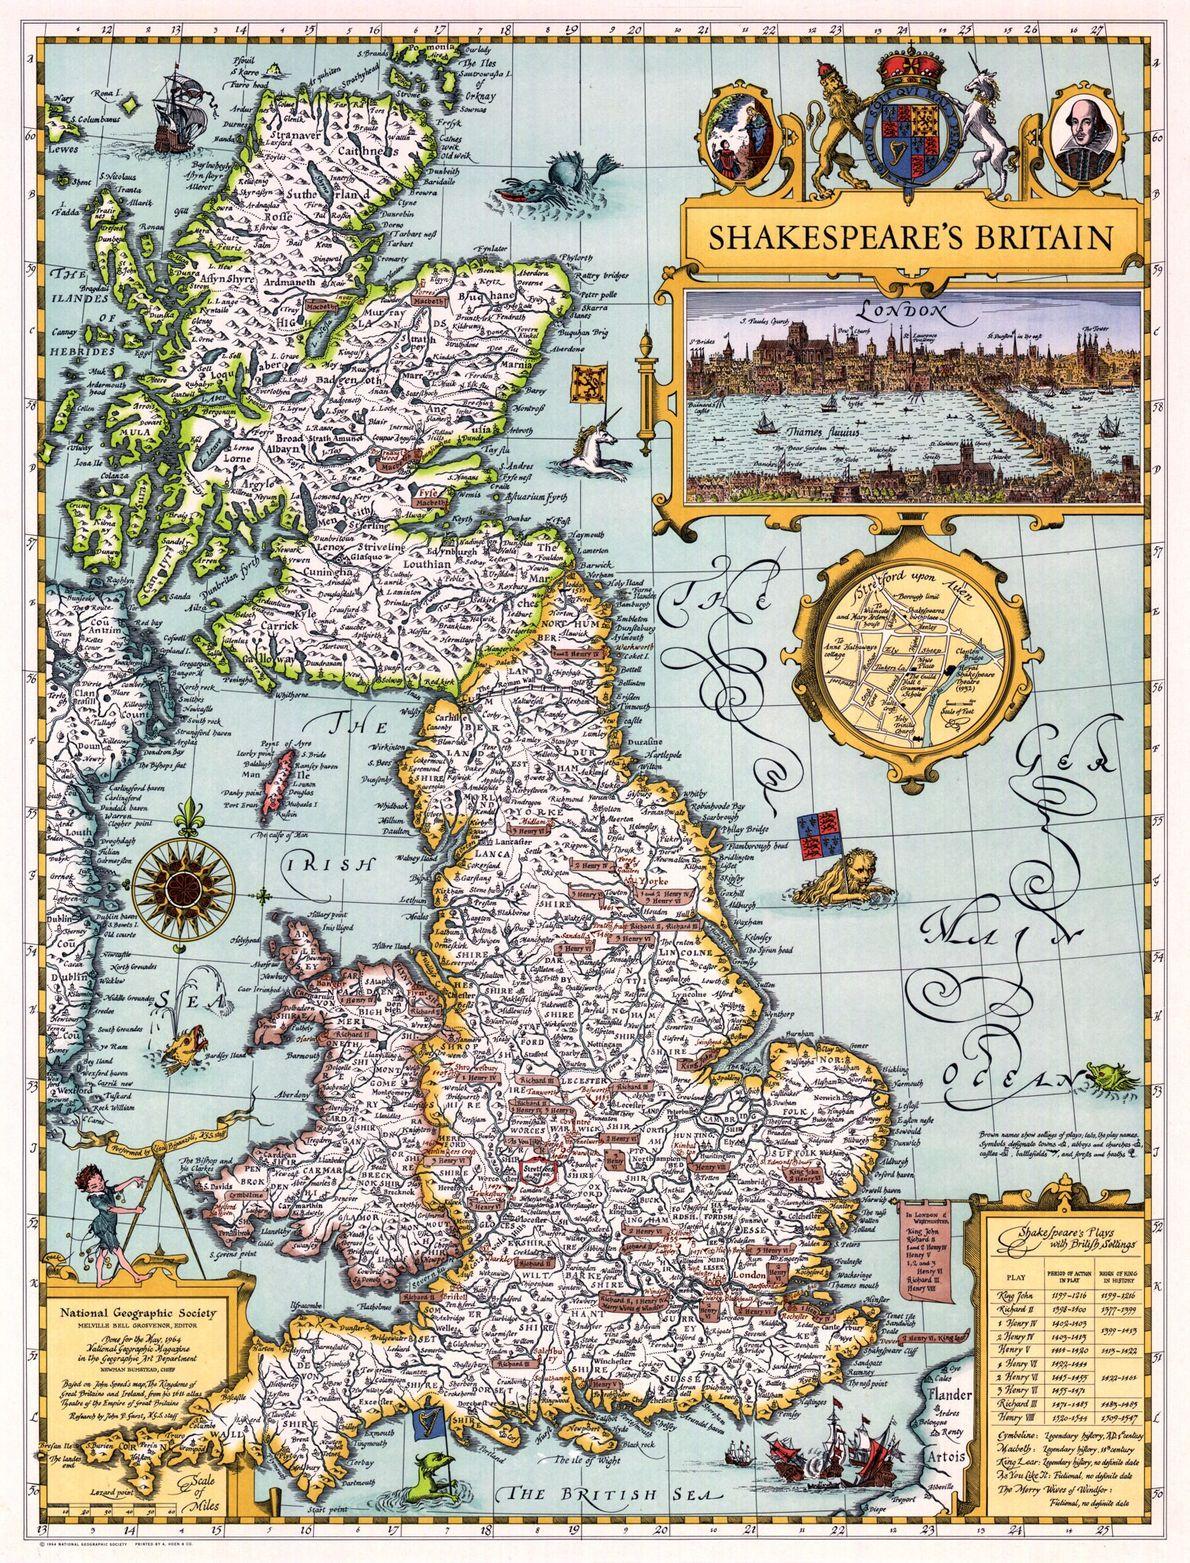 1964 Shakespeare's Britain